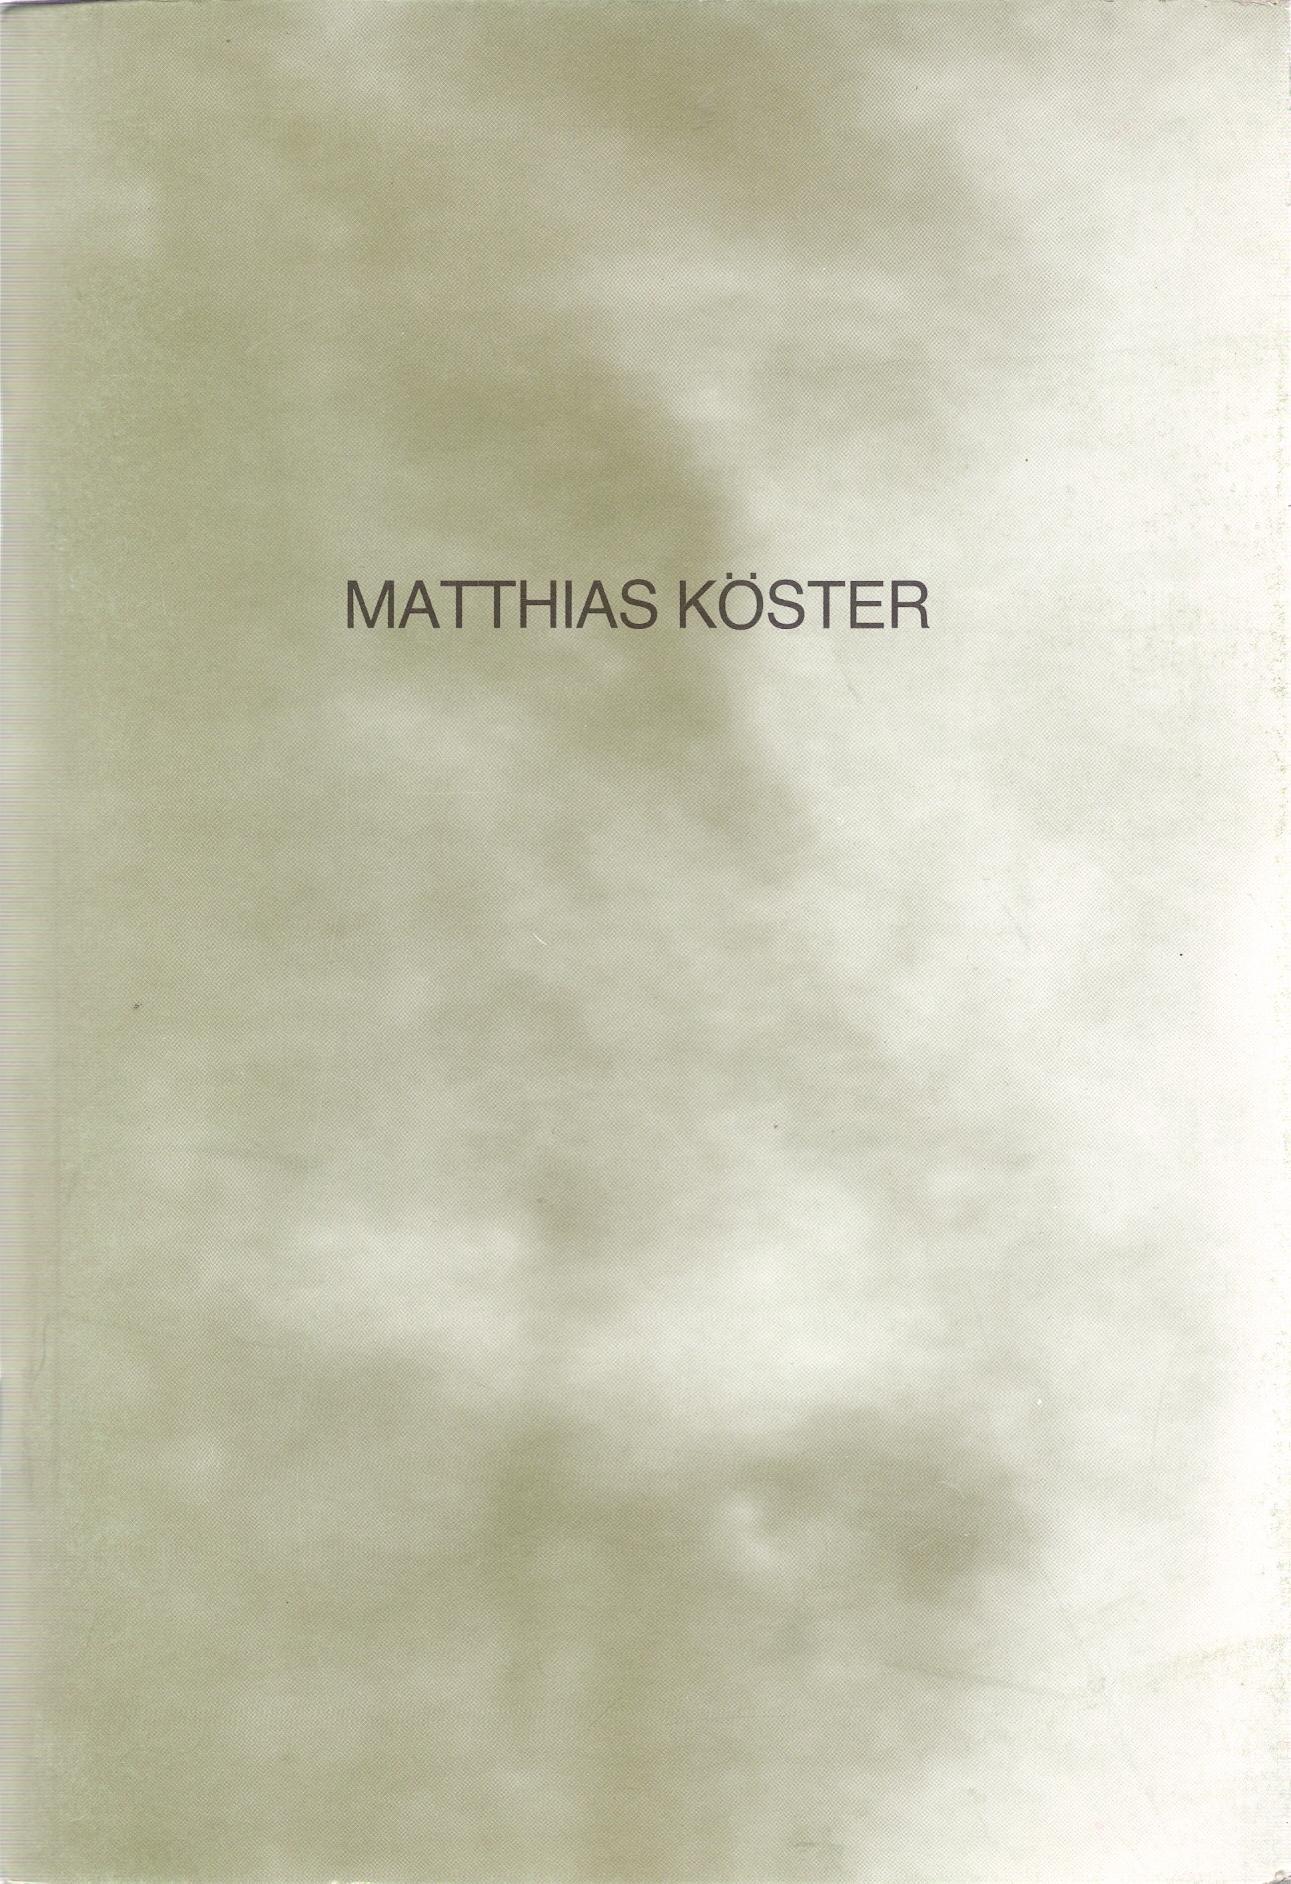 Matthias Köster, 1989